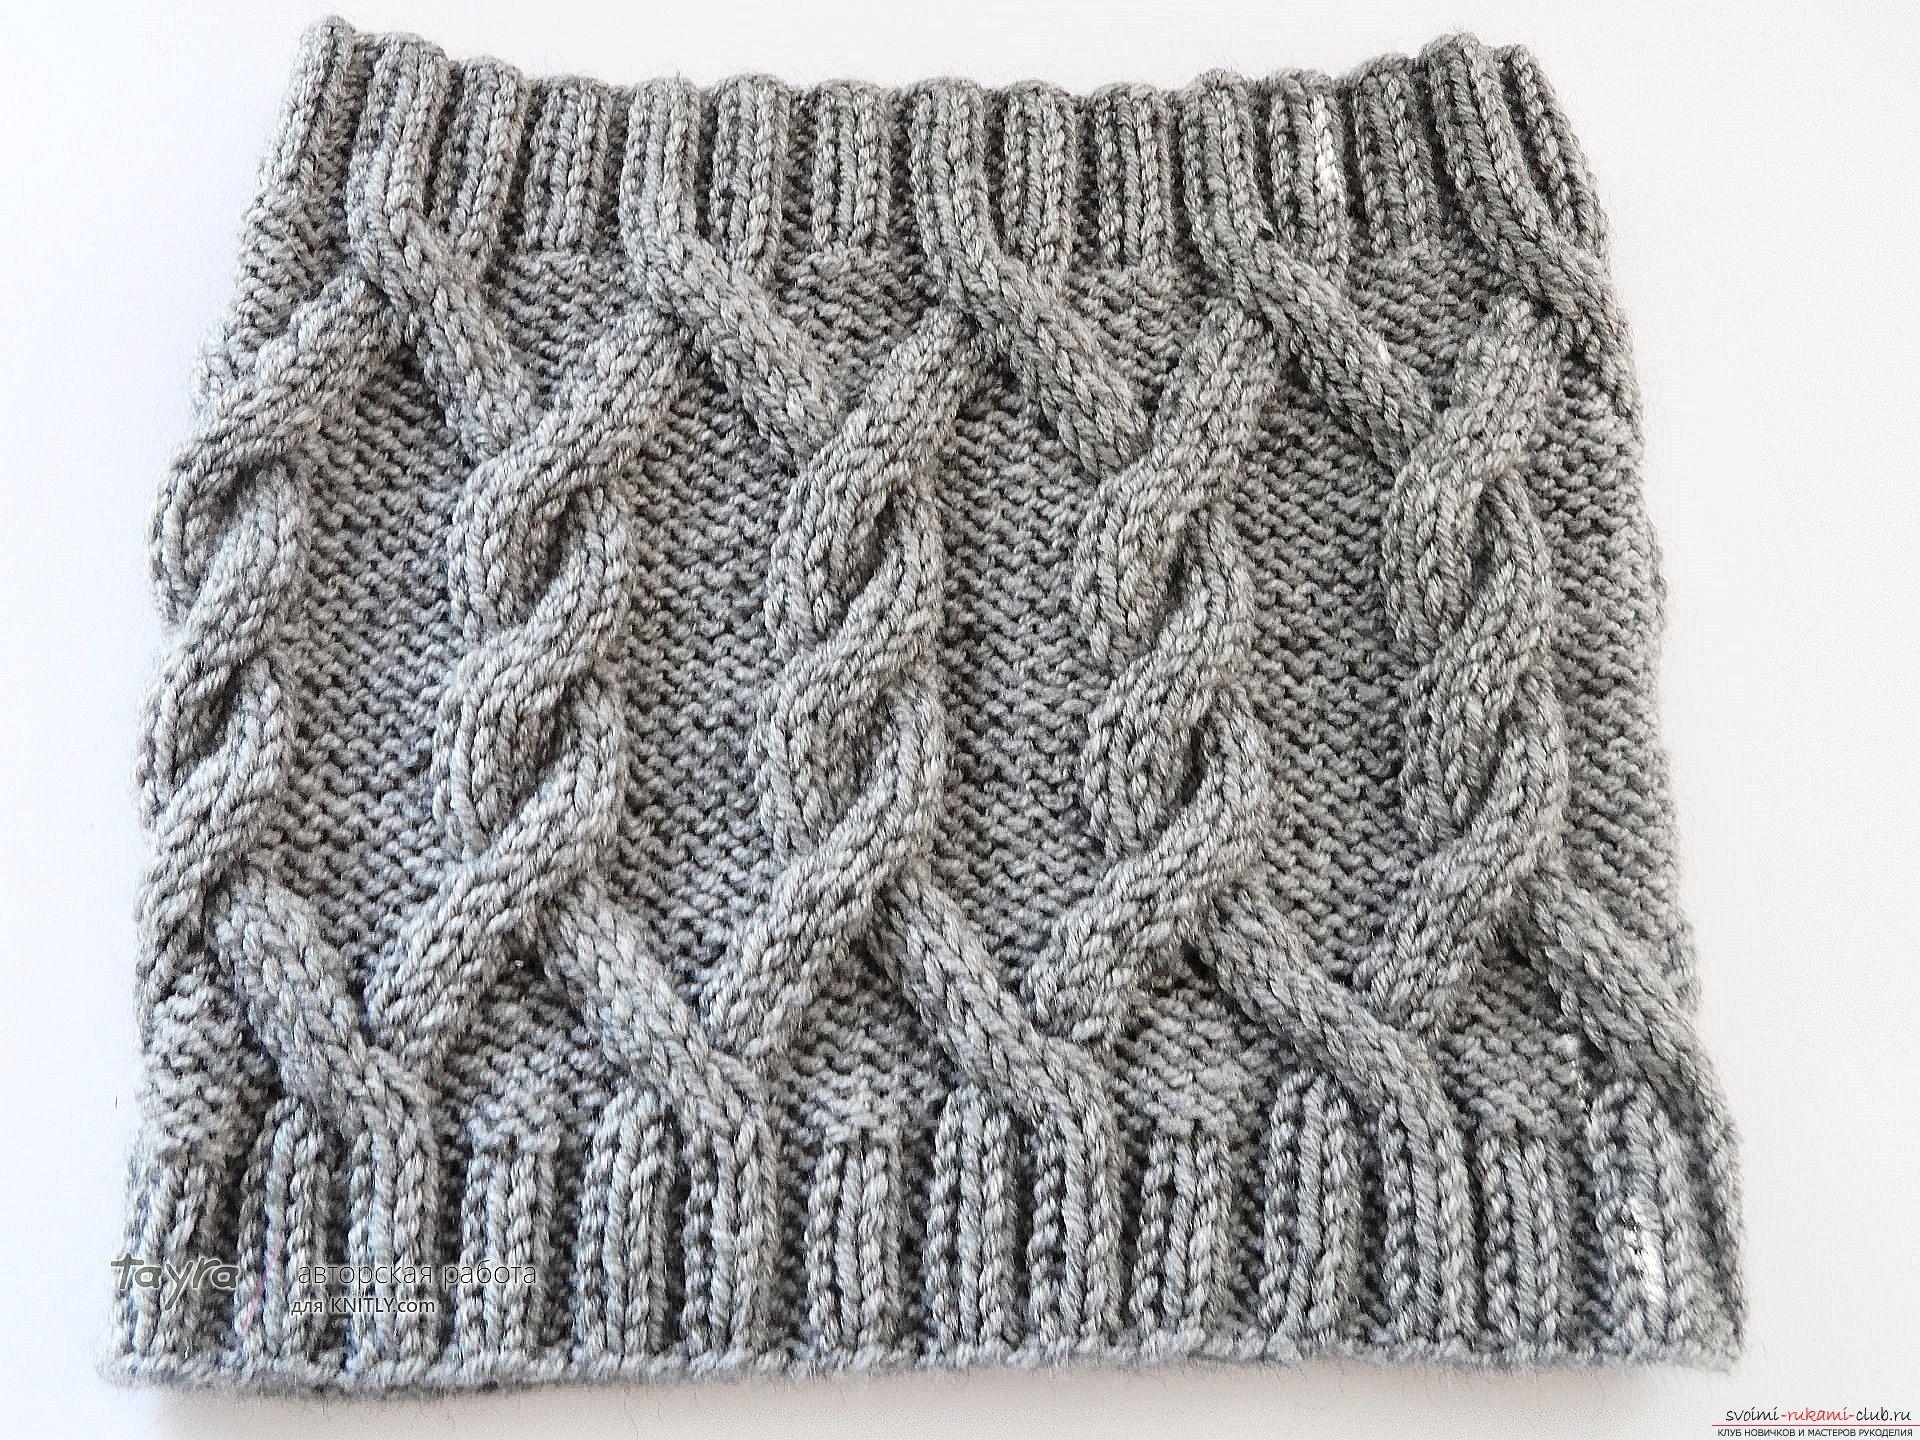 вязаный спицами шарф-снуд. Фото №2 | knit1 - bufandas ...